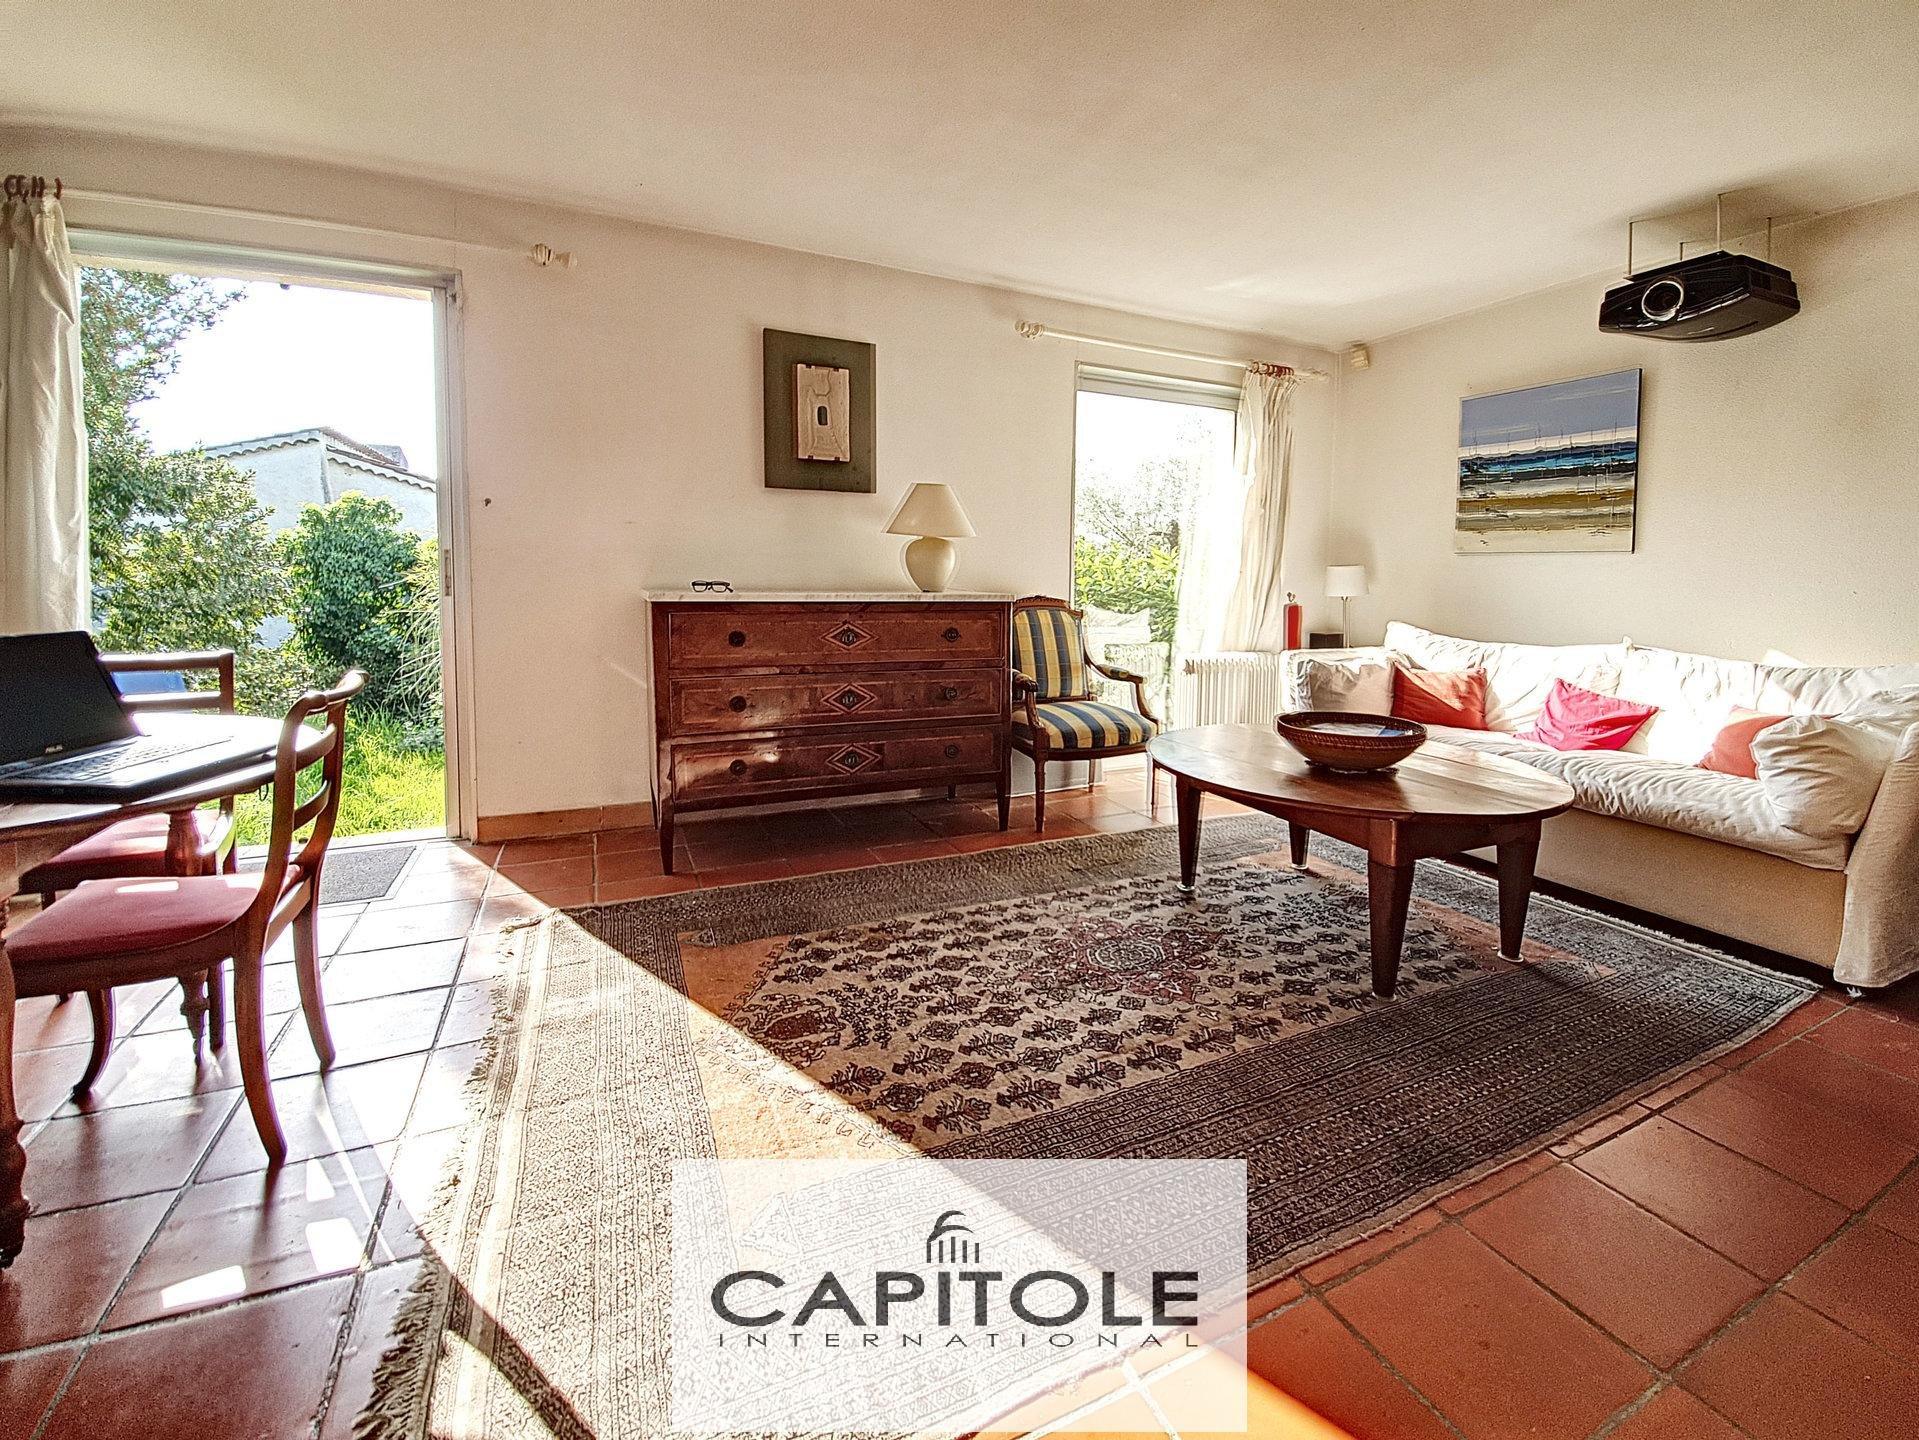 A vendre, Antibes résidentiel, villa 3/4 pièces, calme absolu, résidence avec piscine, jardin sud-ouest